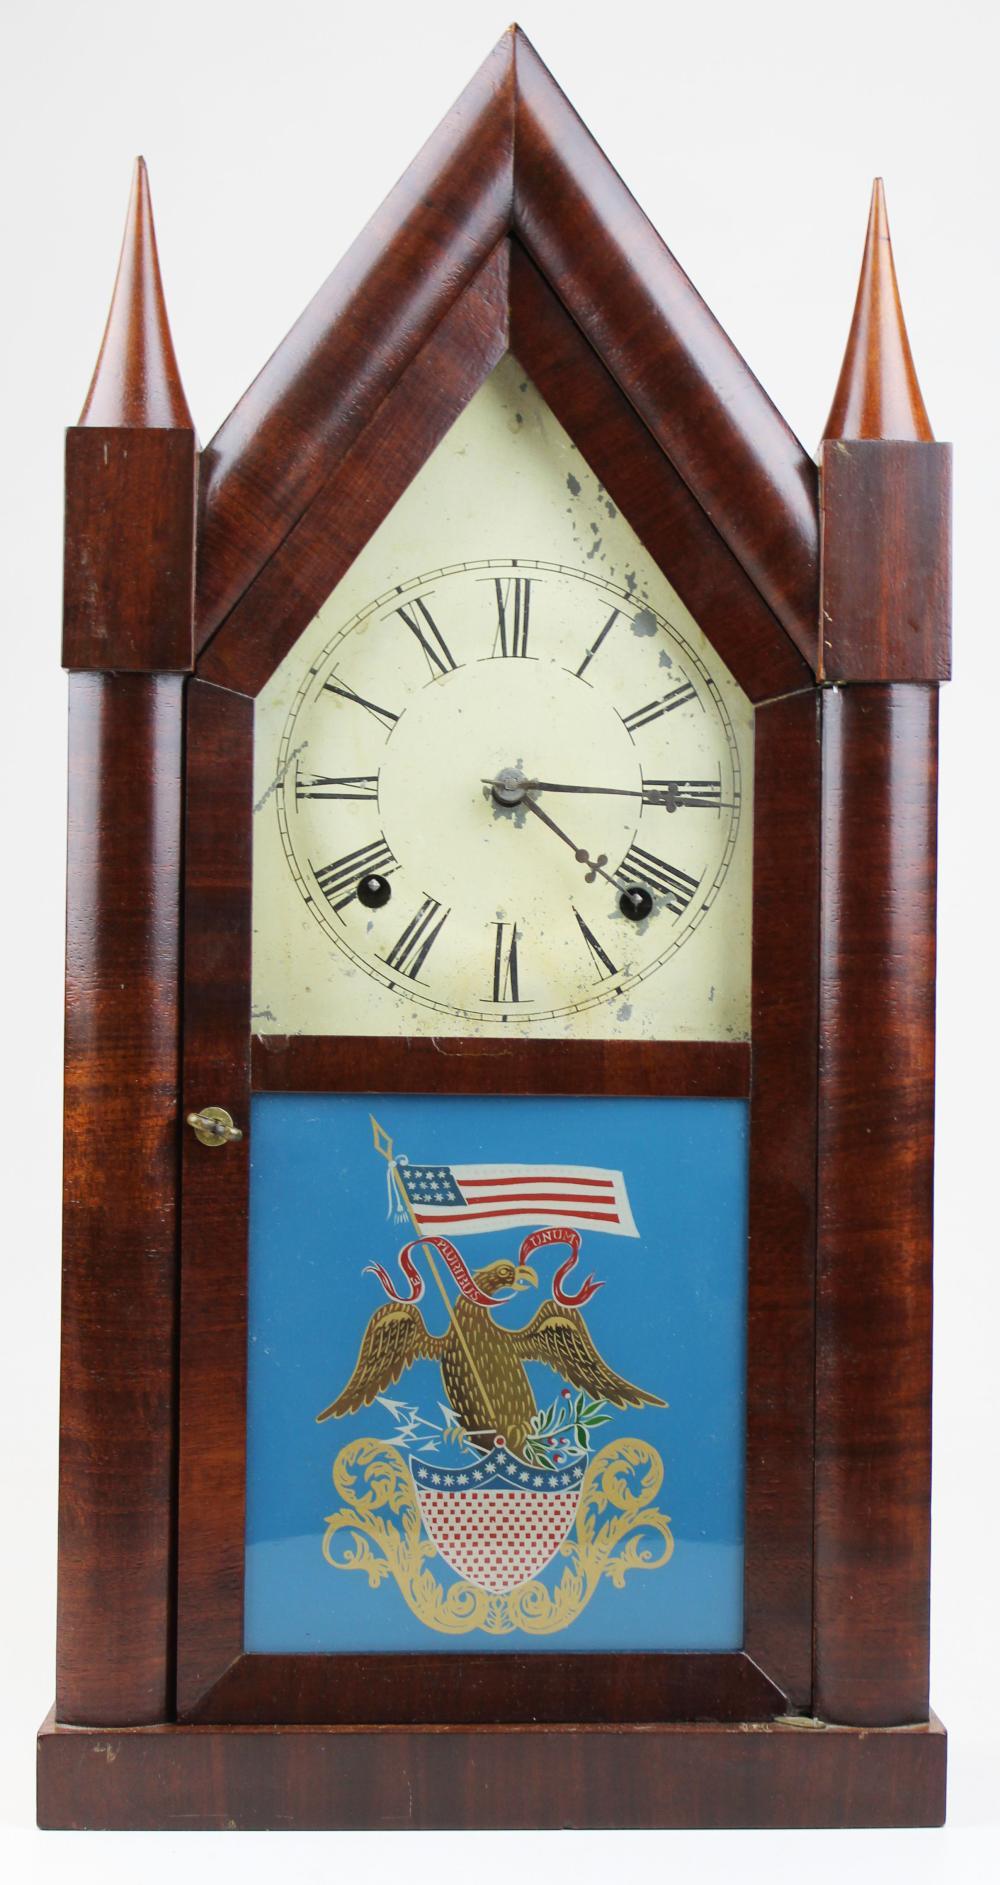 Wm Johnson double fusee steeple clock